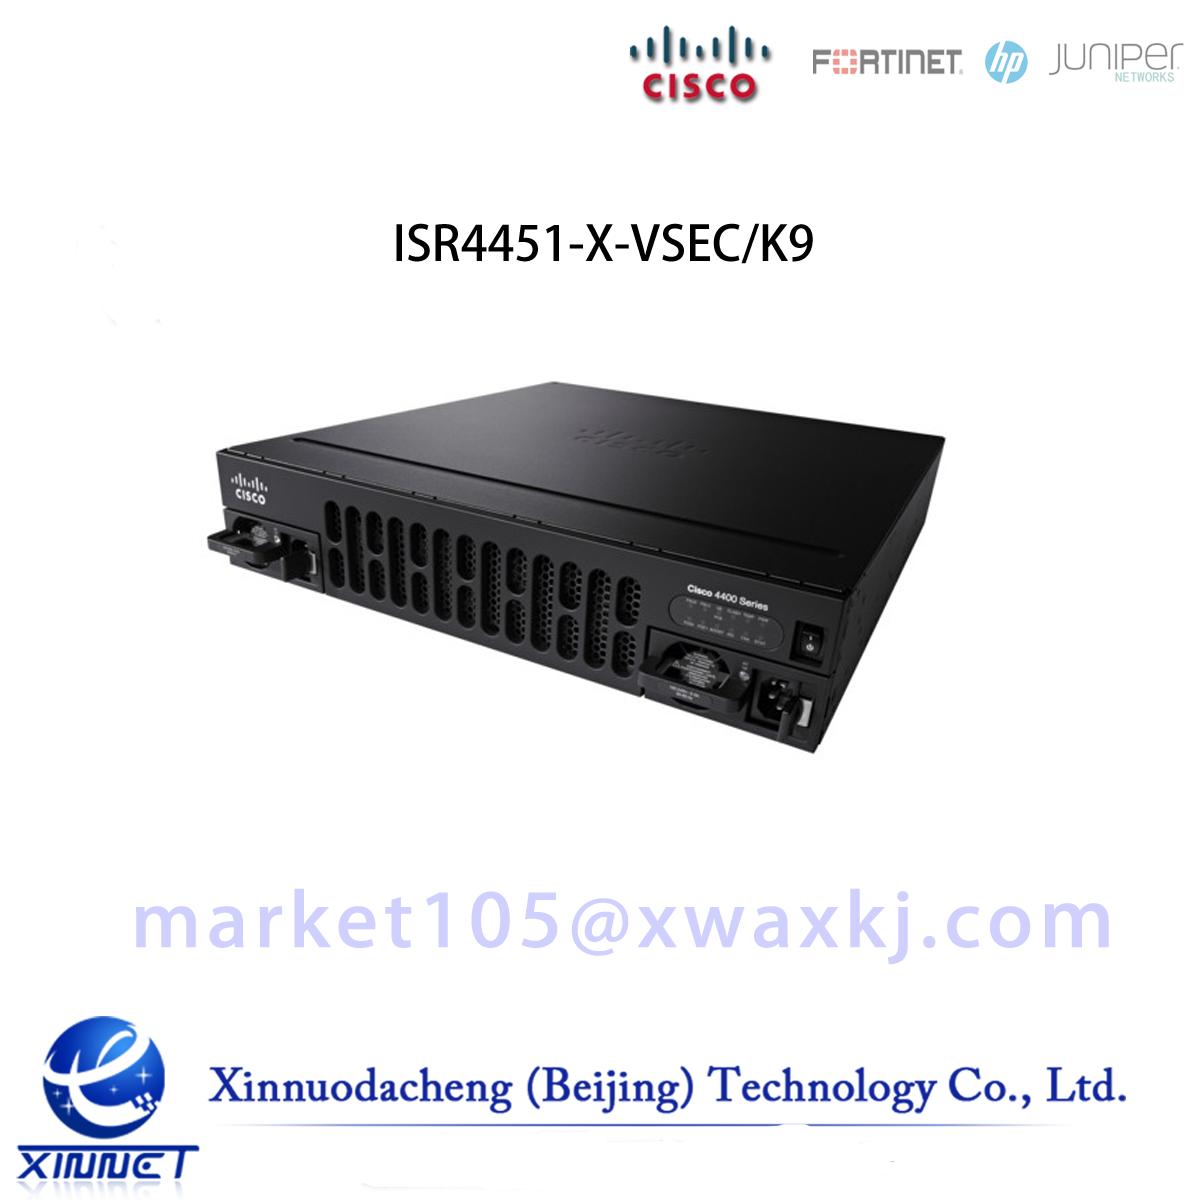 ISR4451-X-VSEC/K9 Cisco ISR 4451 VSEC Bundle, PVDM4-64 w/ UC,SEC Lic,CUBE- 25